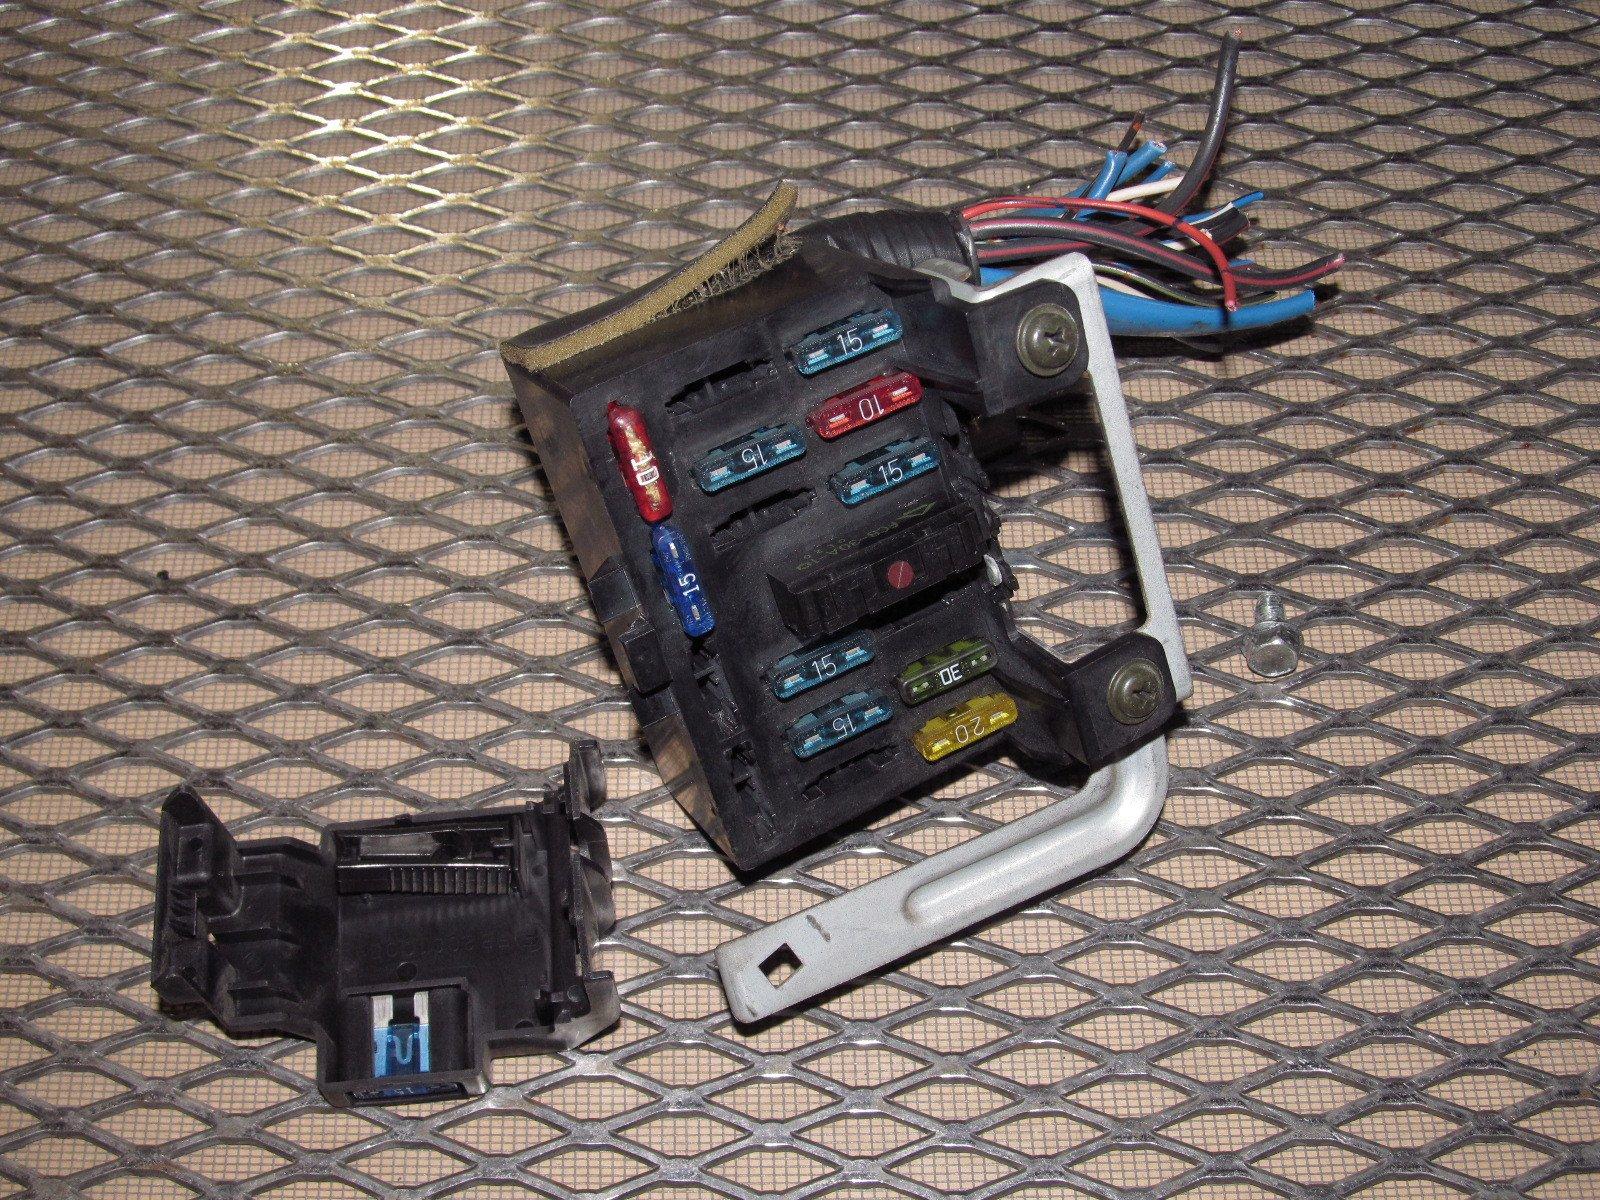 95 240sx fuse diagram mo 5266  1991 nissan 240sx interior fuse diagram  1991 nissan 240sx interior fuse diagram